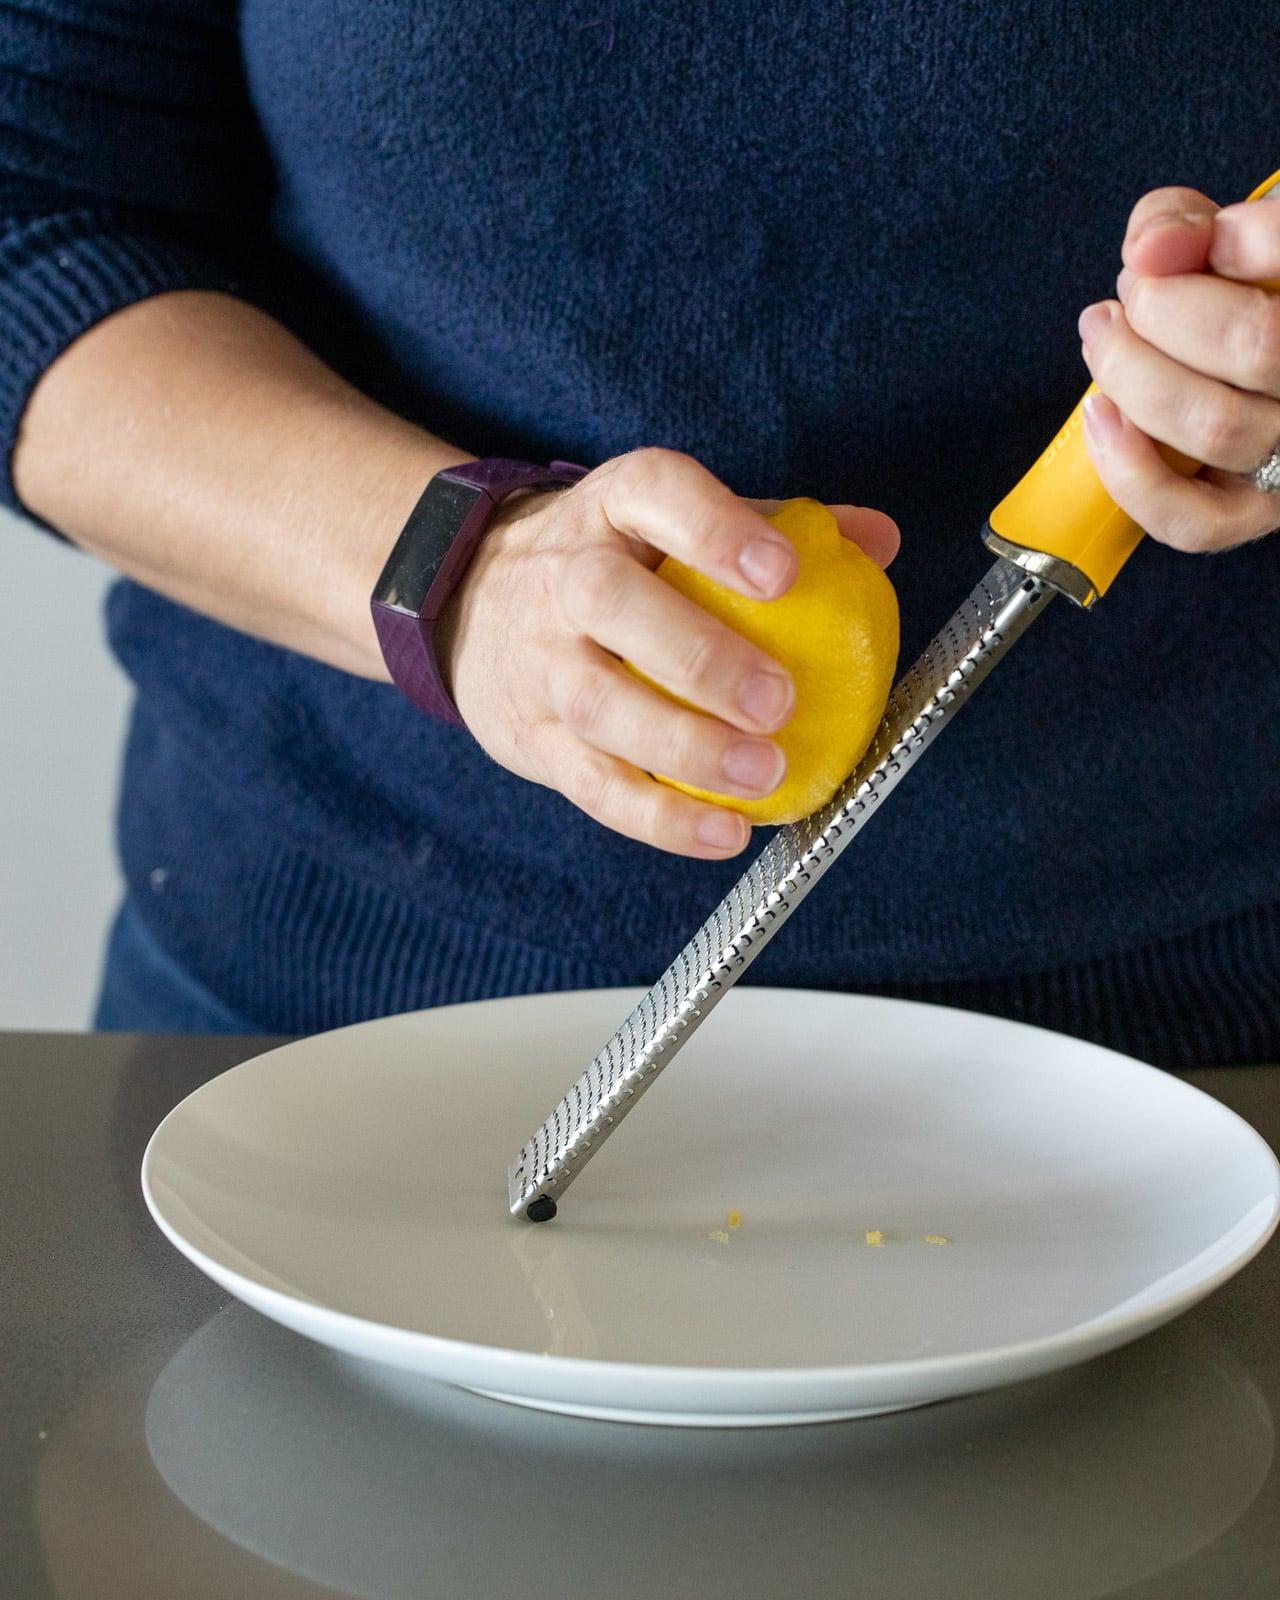 woman zesting lemon onto a plate